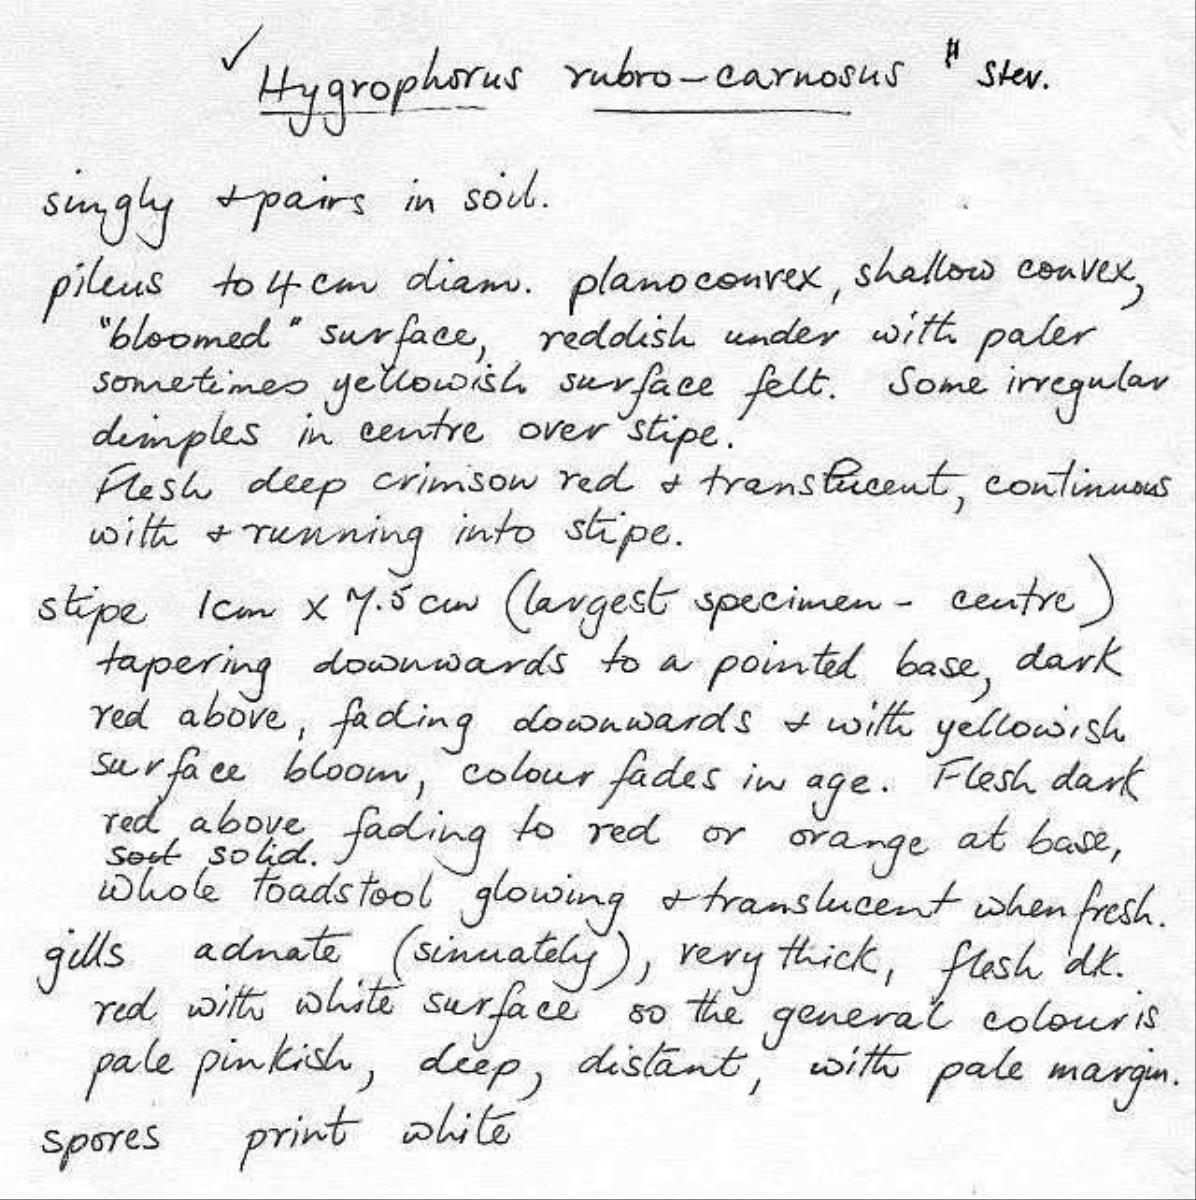 Image of Hygrophorus rubrocarnosus